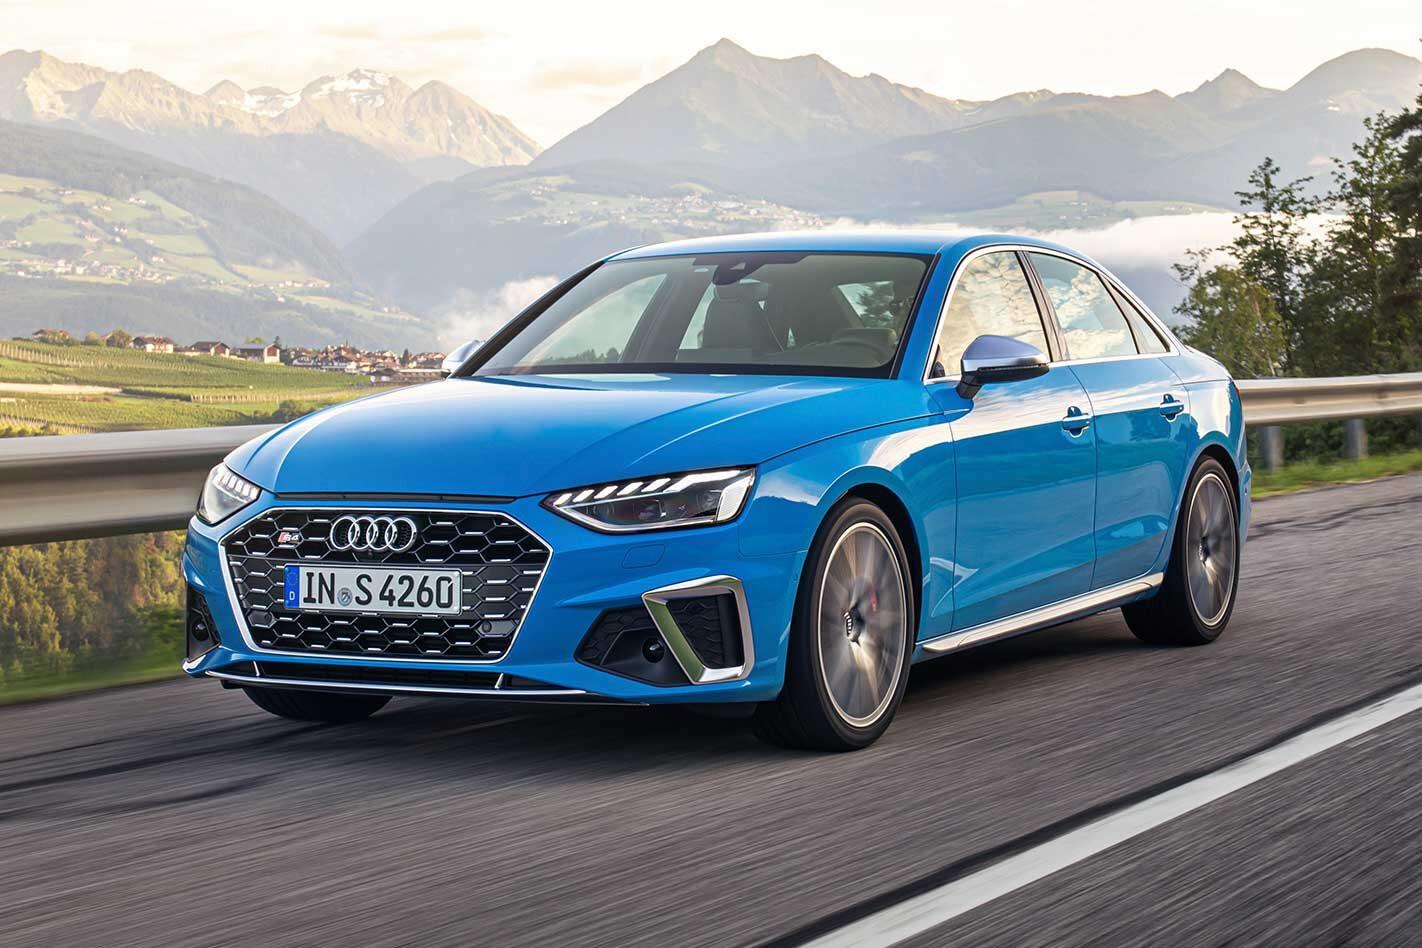 2019 Audi S4 TDI performance review